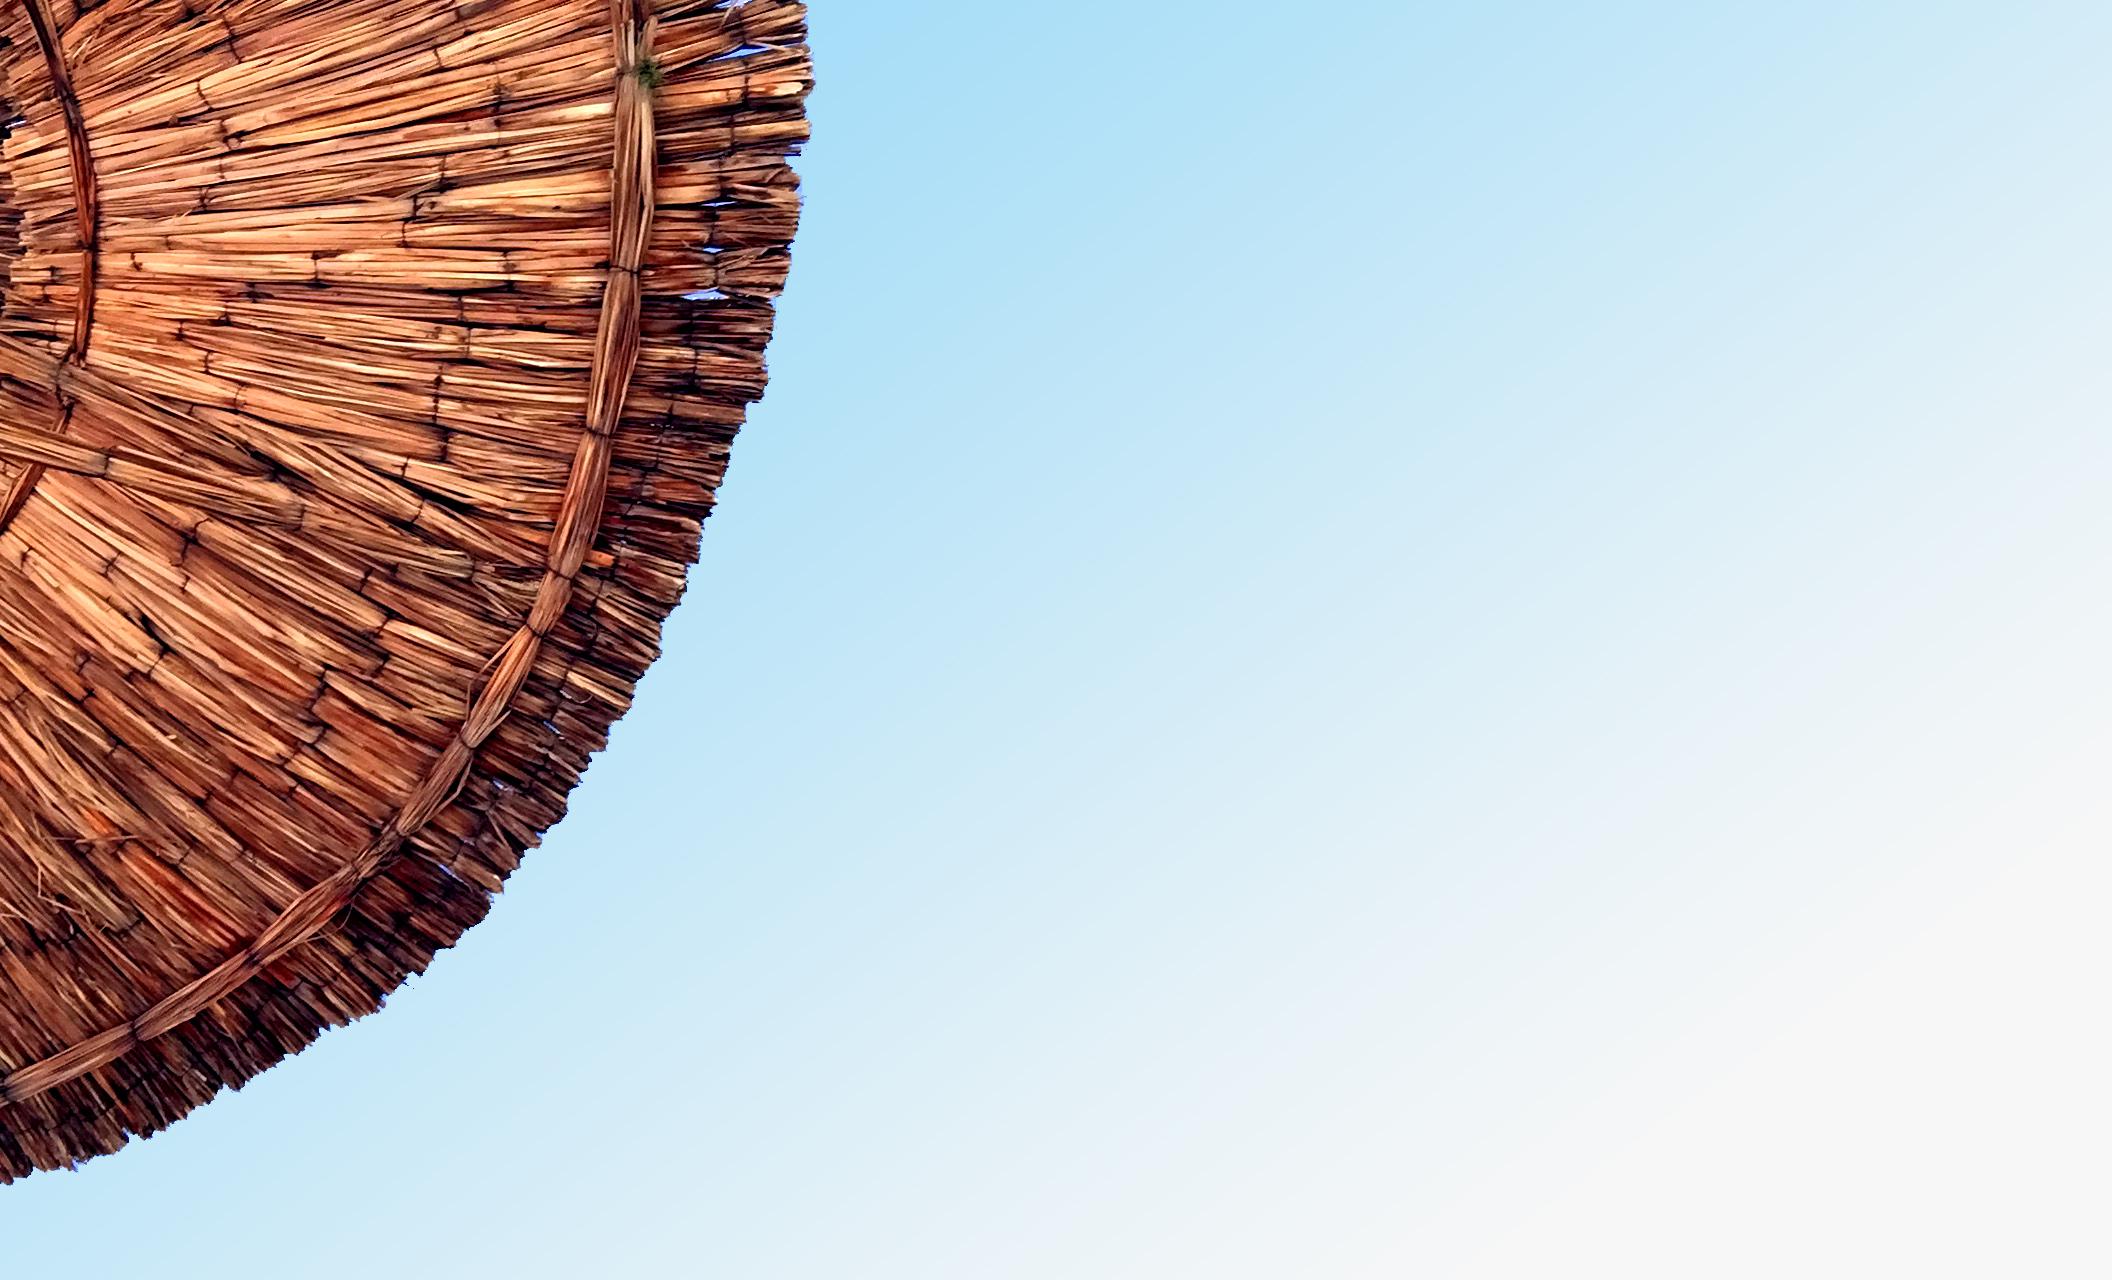 The Best FREE Stock Photo Sites | Pexels